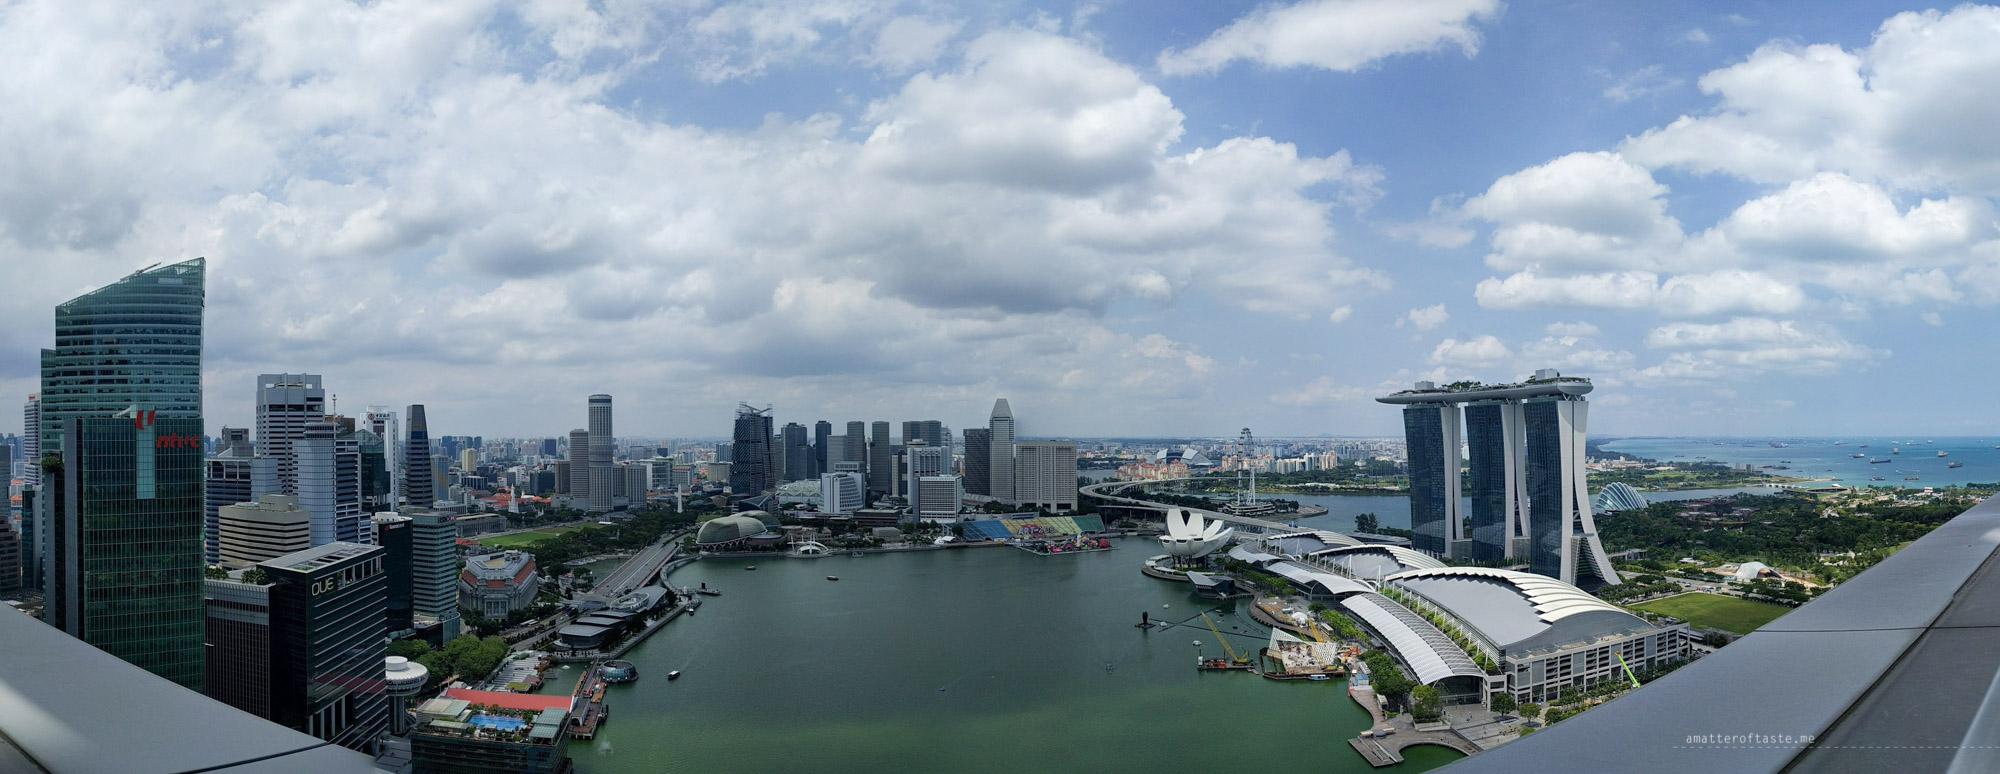 04-level33-brewery-singapore-panorama